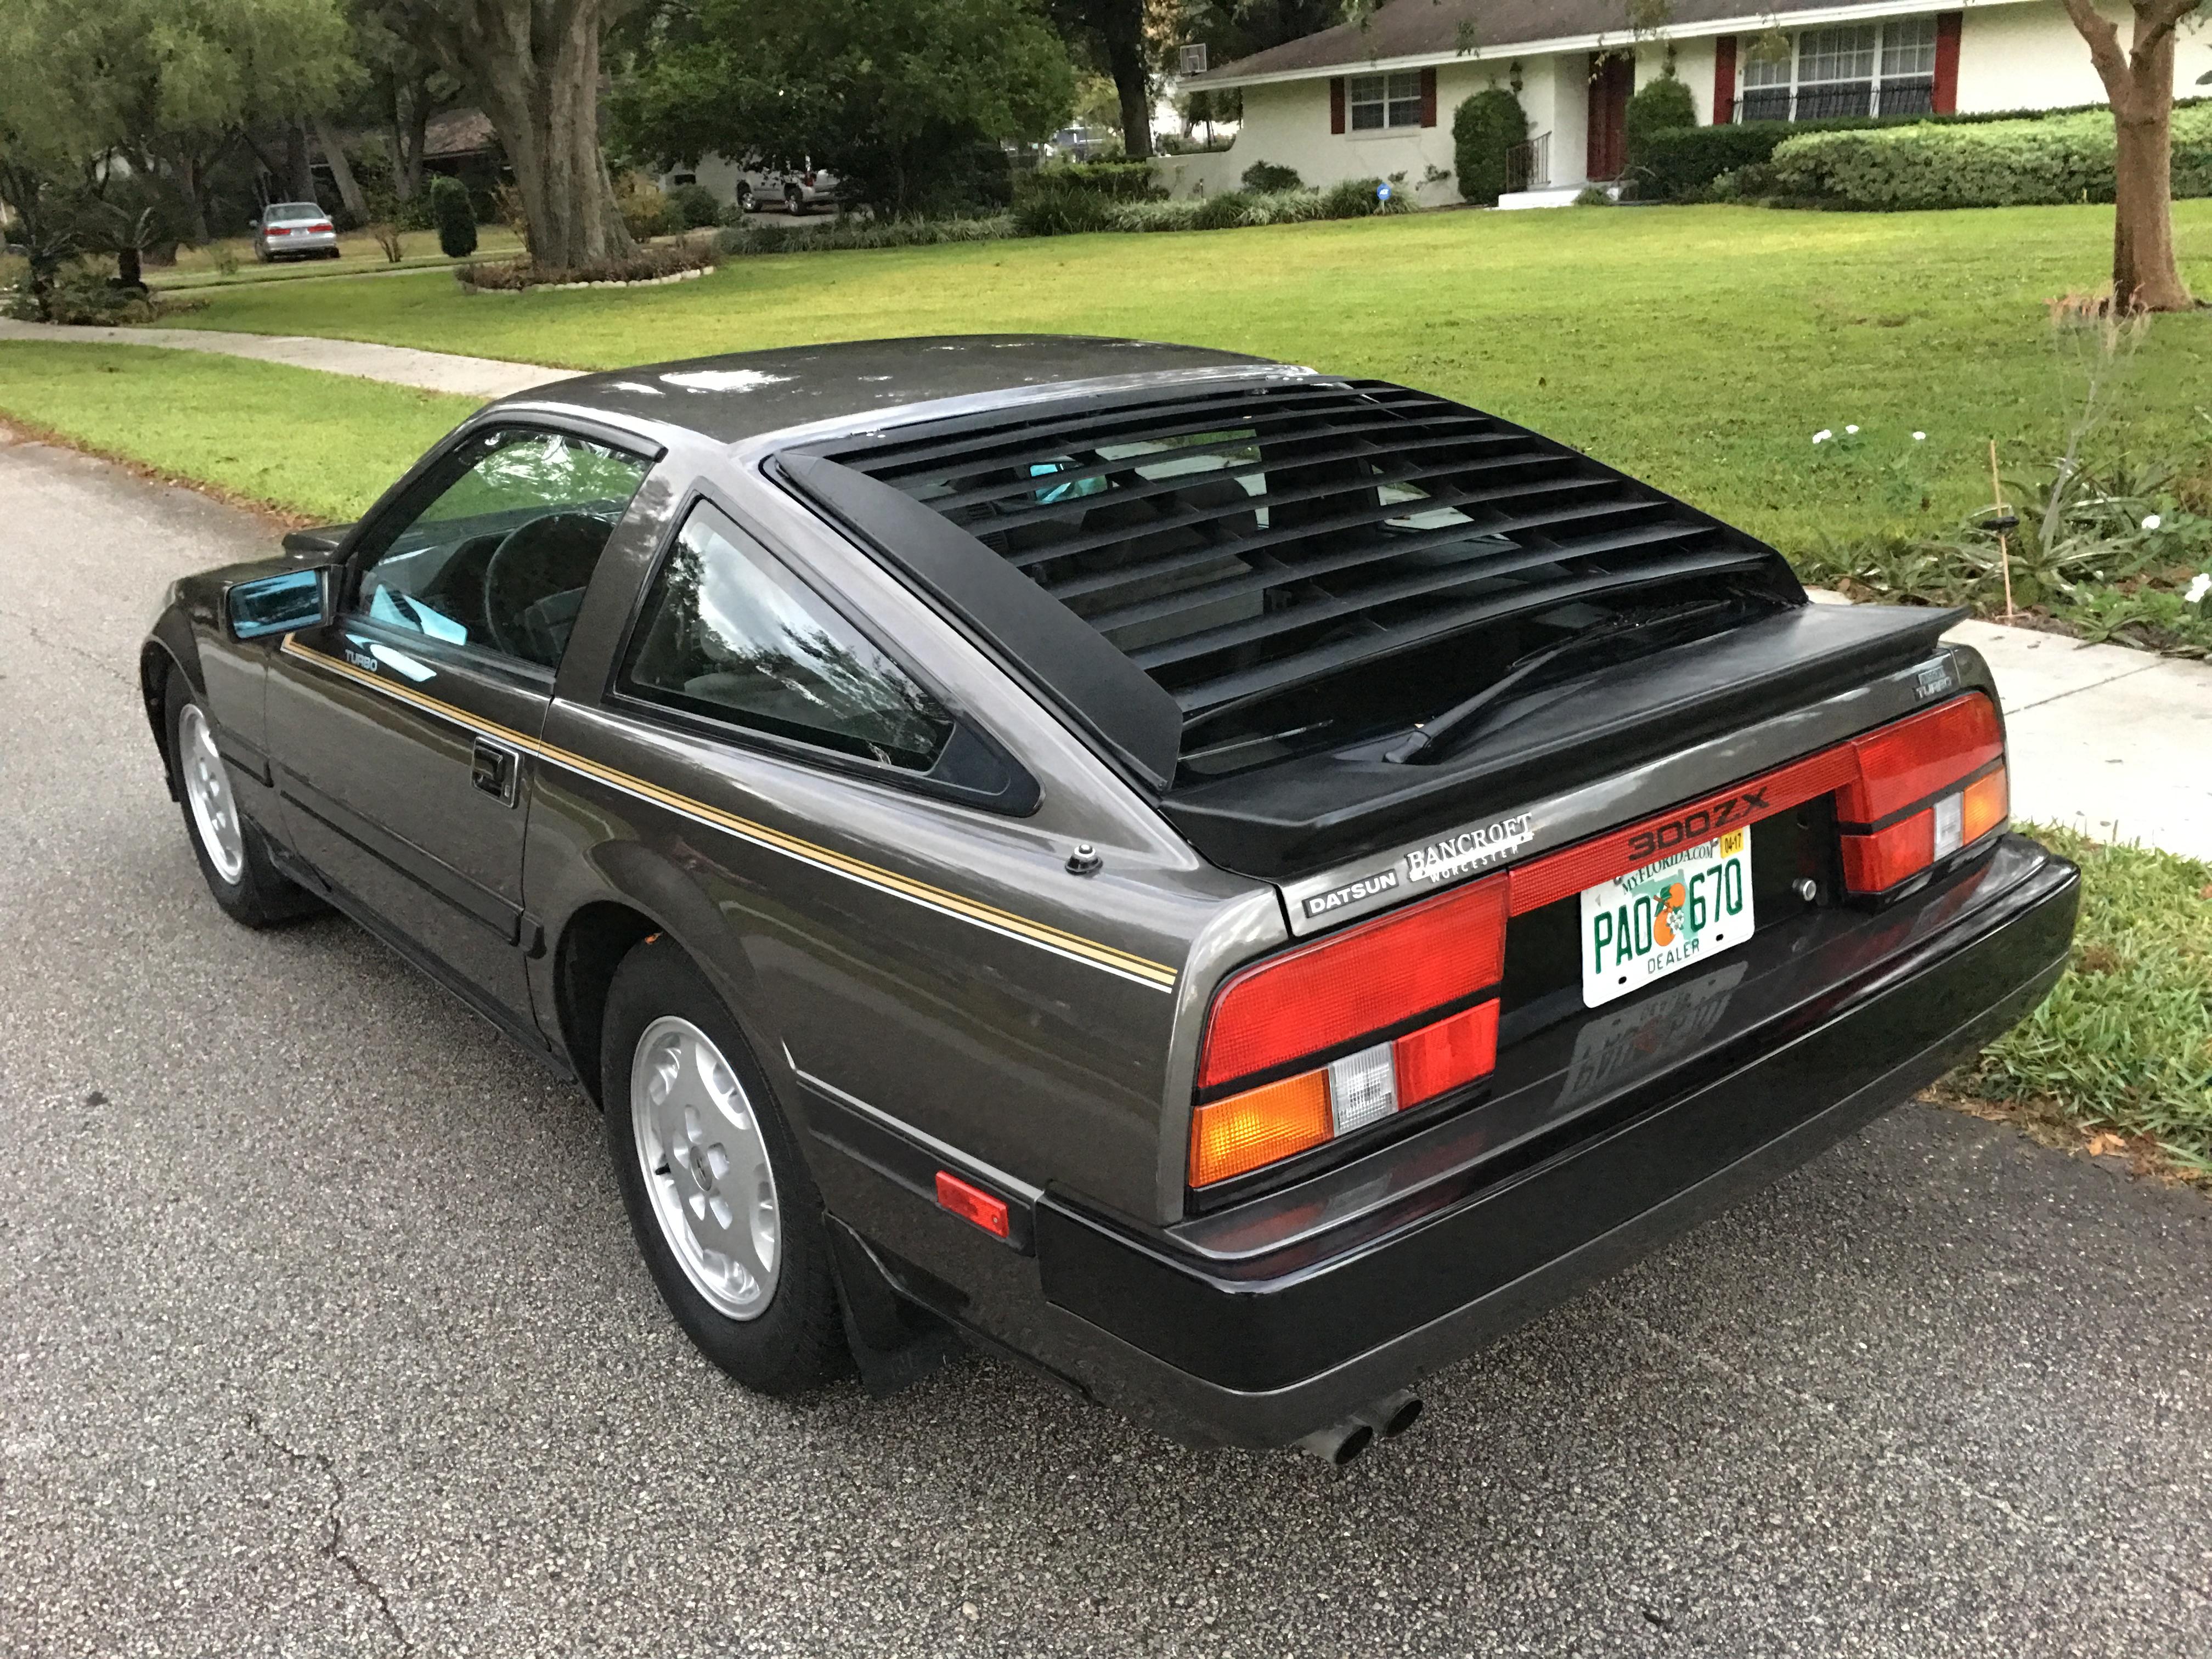 1984 Datsun/Nissan 300ZX Turbo